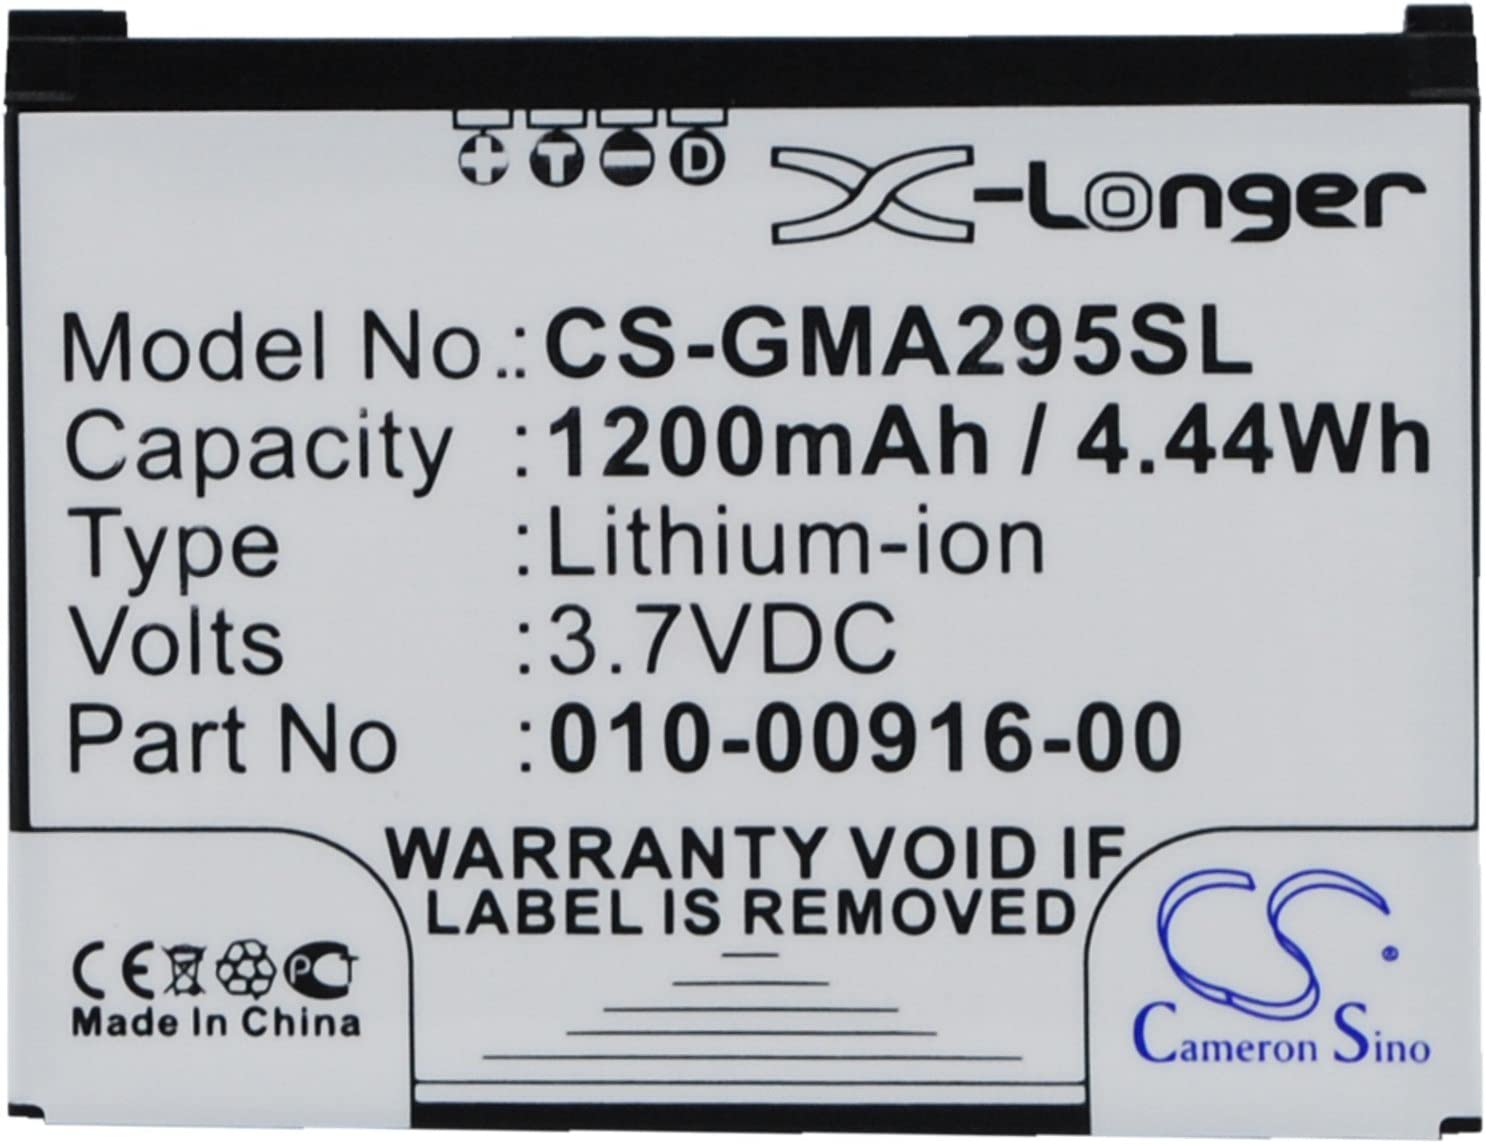 Cameron Sino 1200mAh Battery for Garmin Nuvi 295 Nuvi 295W